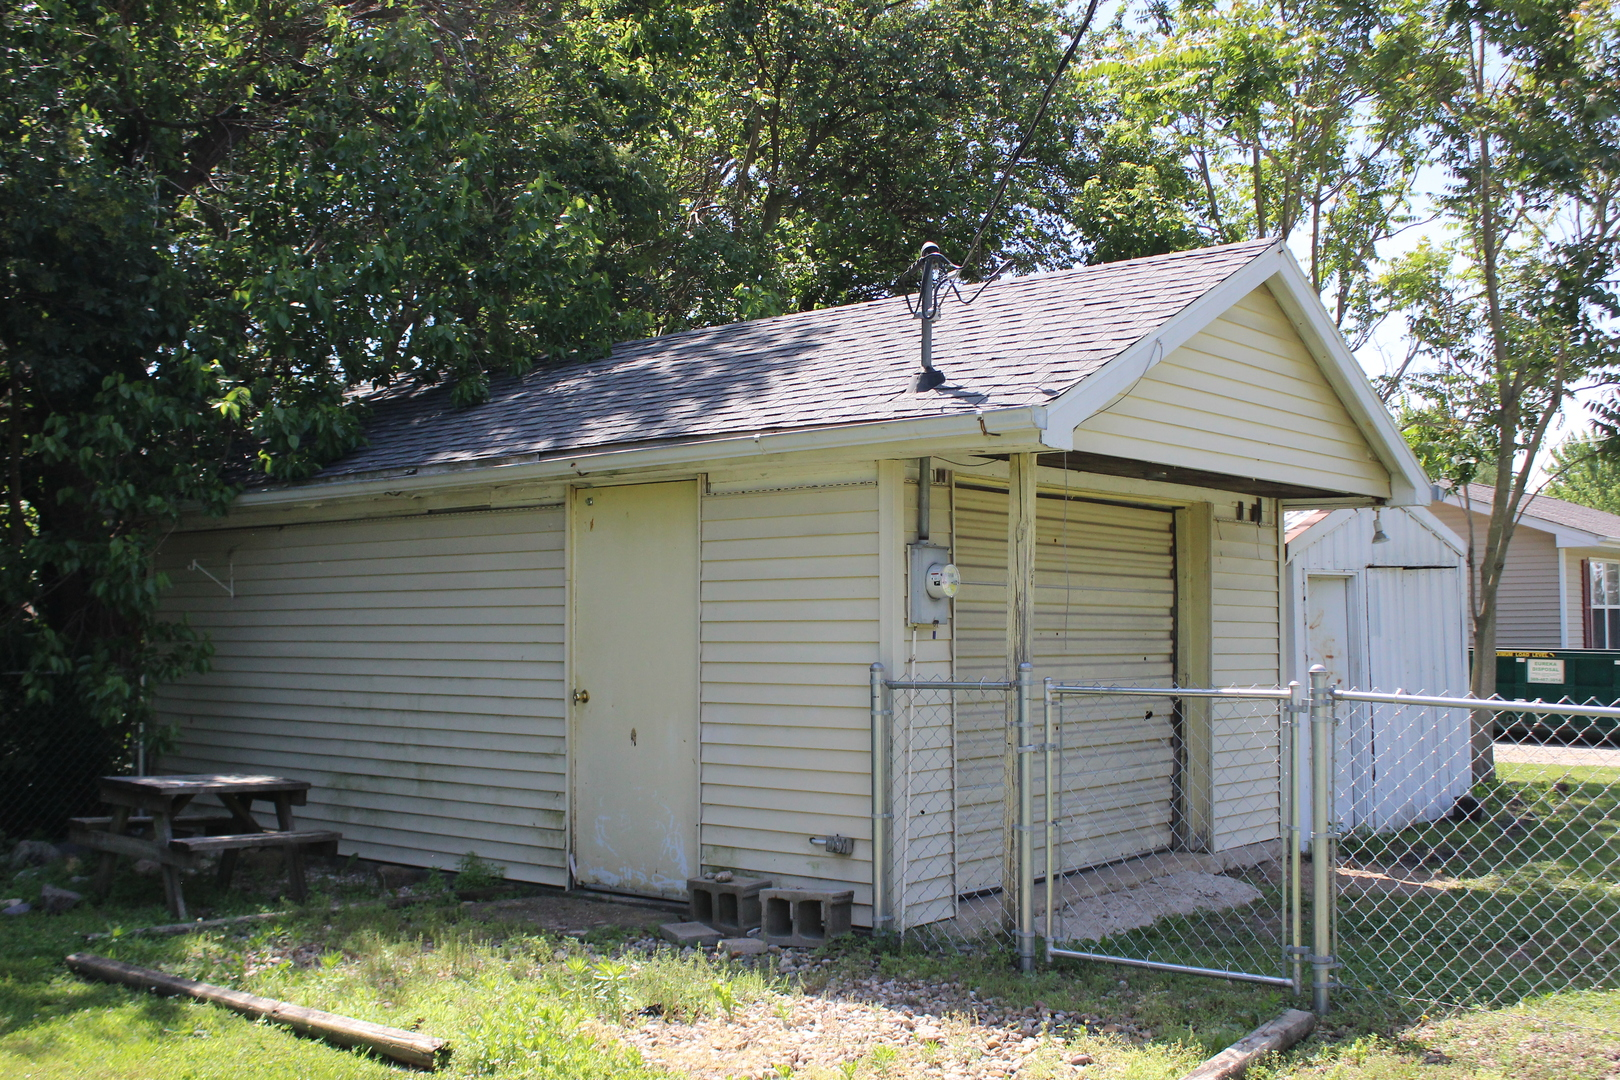 201 South Maple, EL PASO, Illinois, 61738